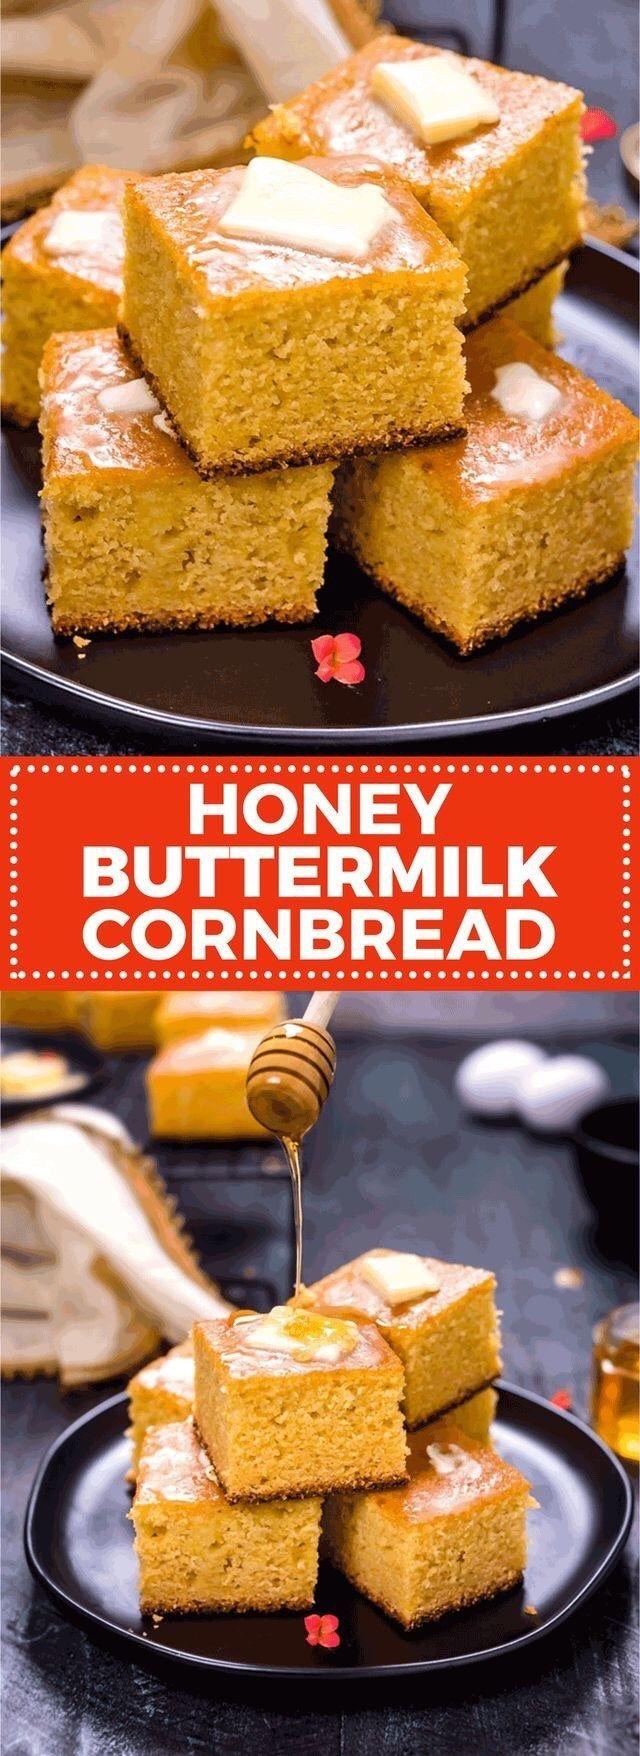 Honey Buttermilk Cornbread Host The Toast Recipe Buttermilk Cornbread Honey Cornbread Sweet Cornbread